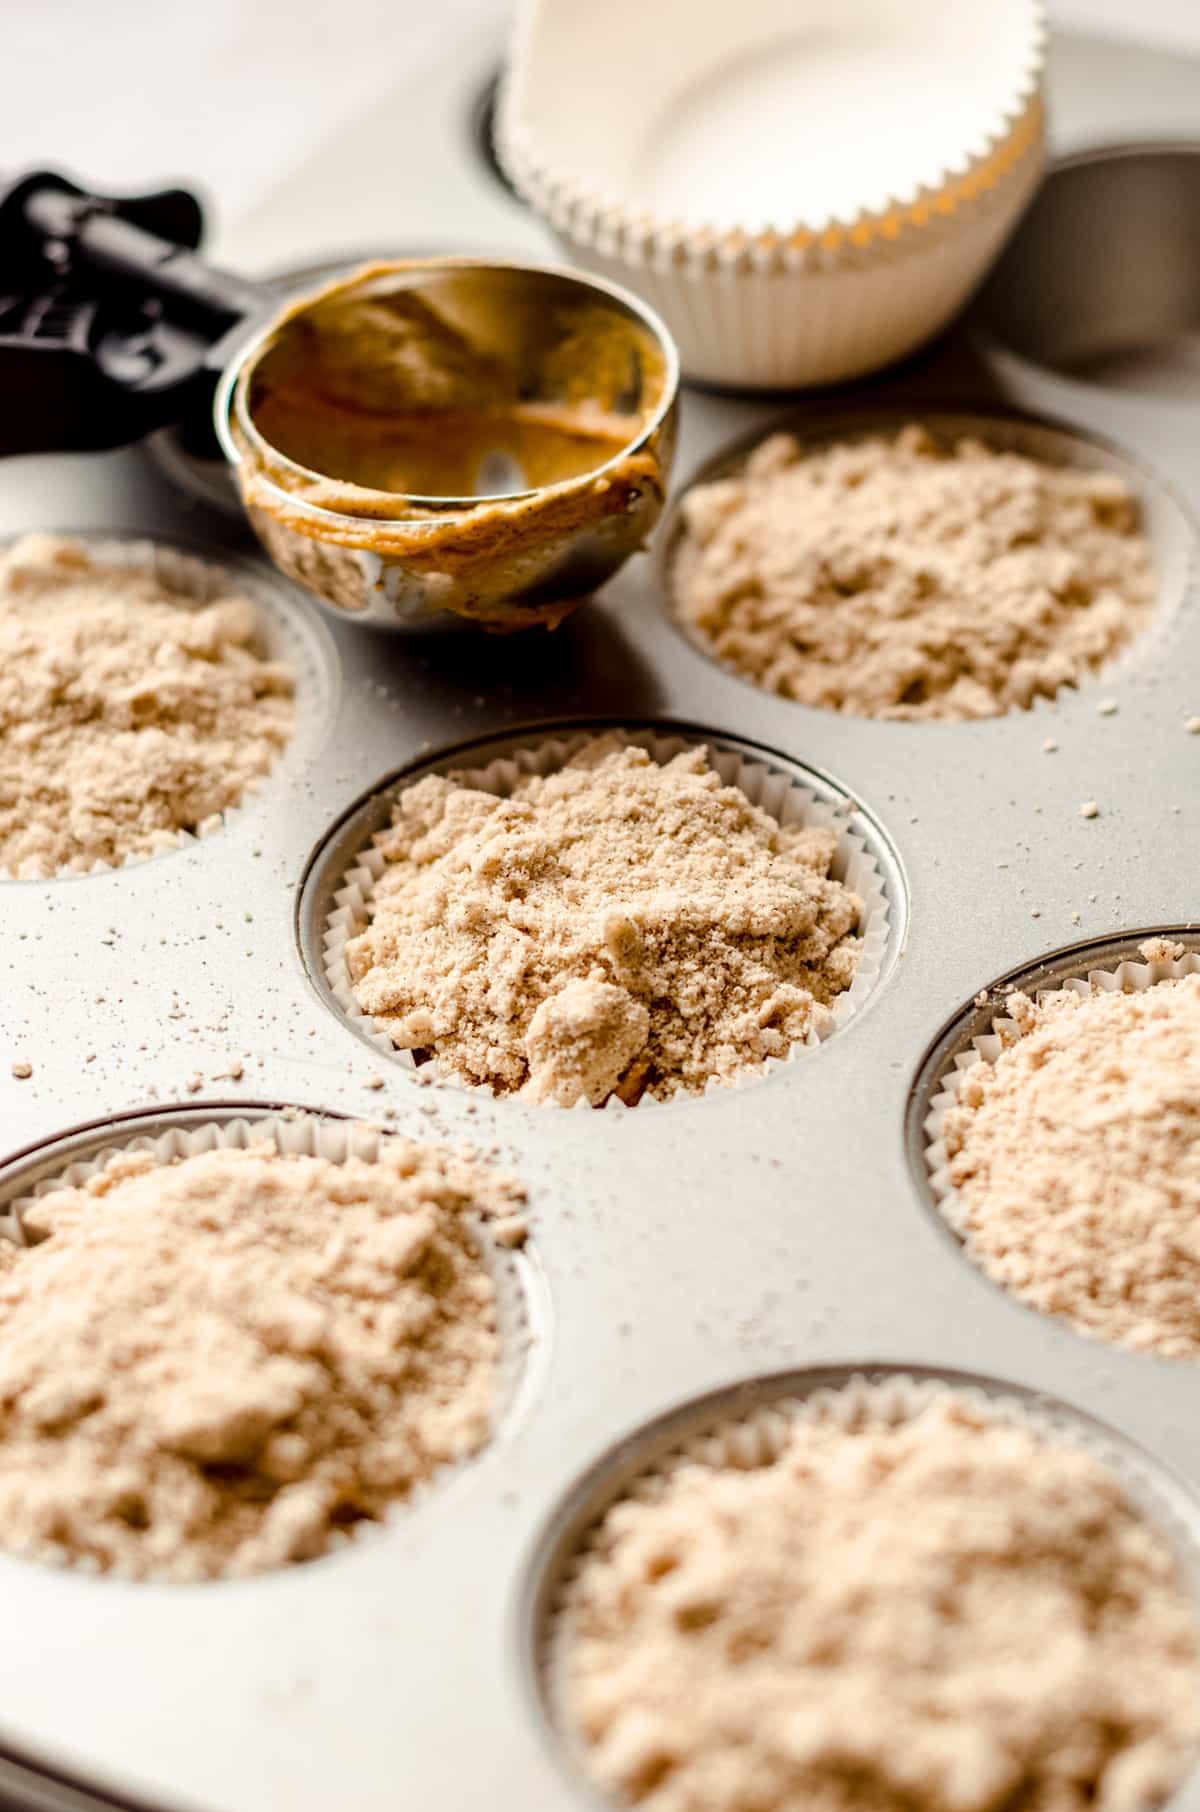 pumpkin streusel muffin batter in a muffin pan ready to bake